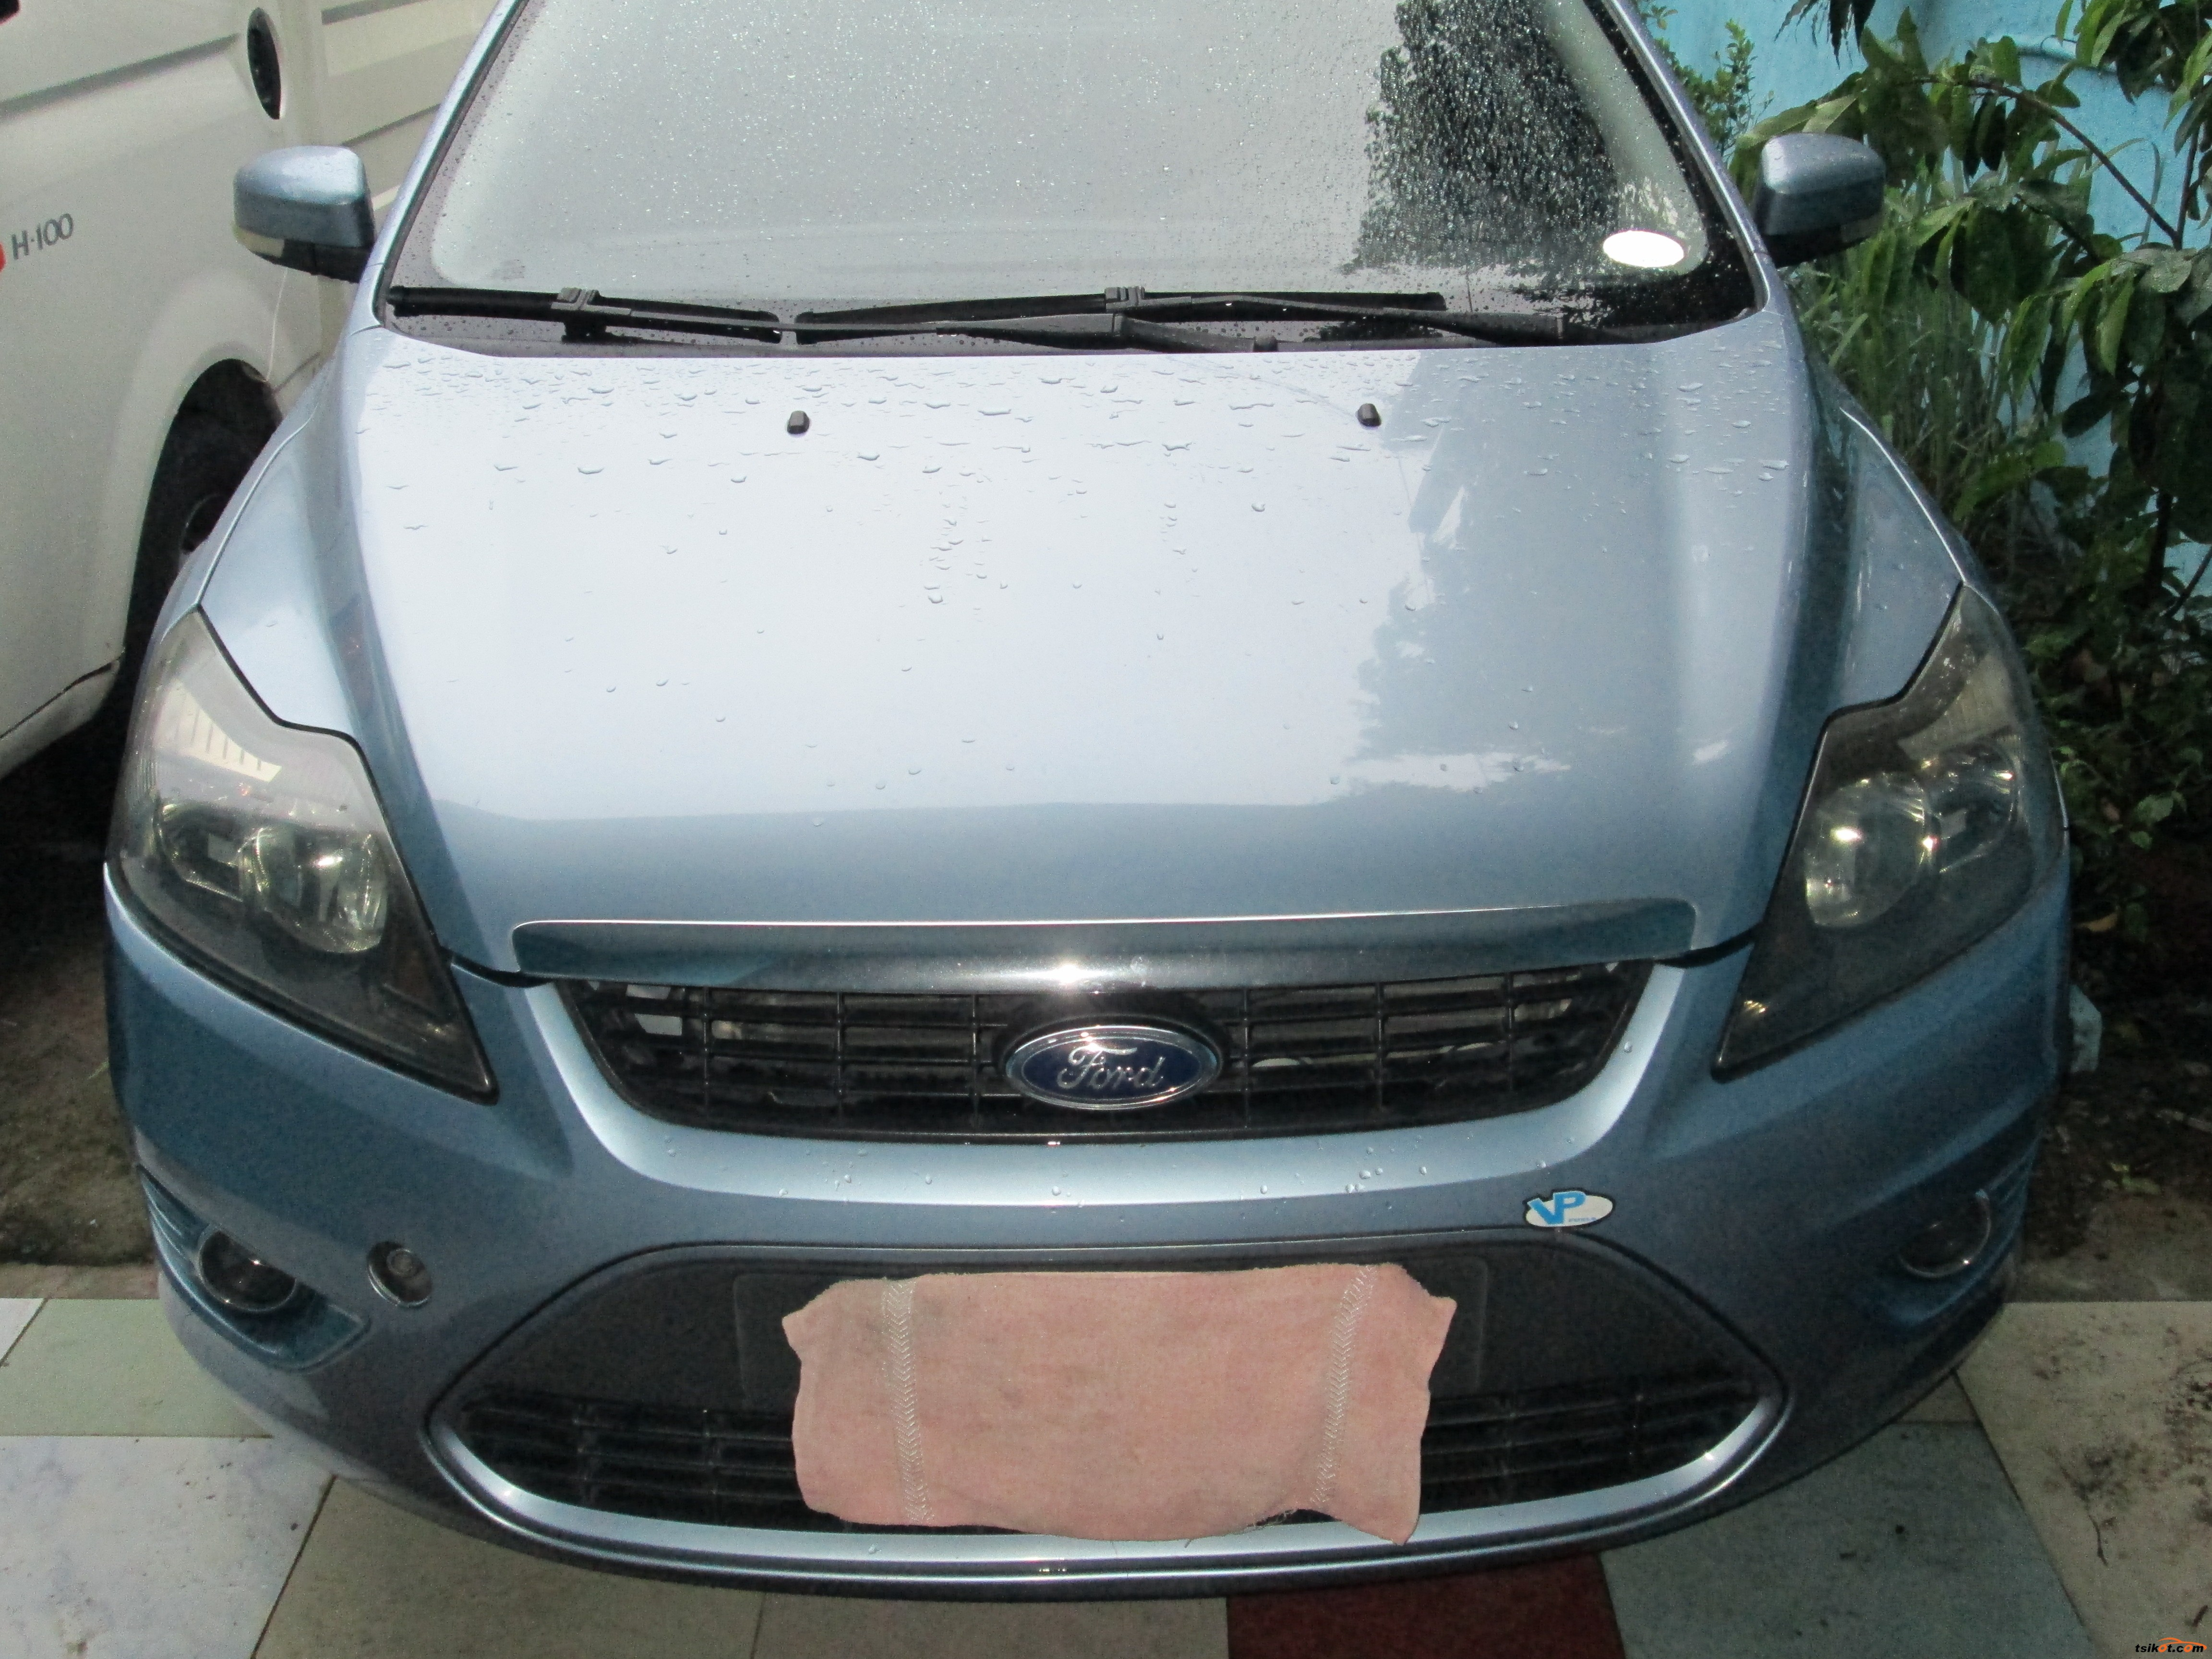 Ford Focus 2012 - 1